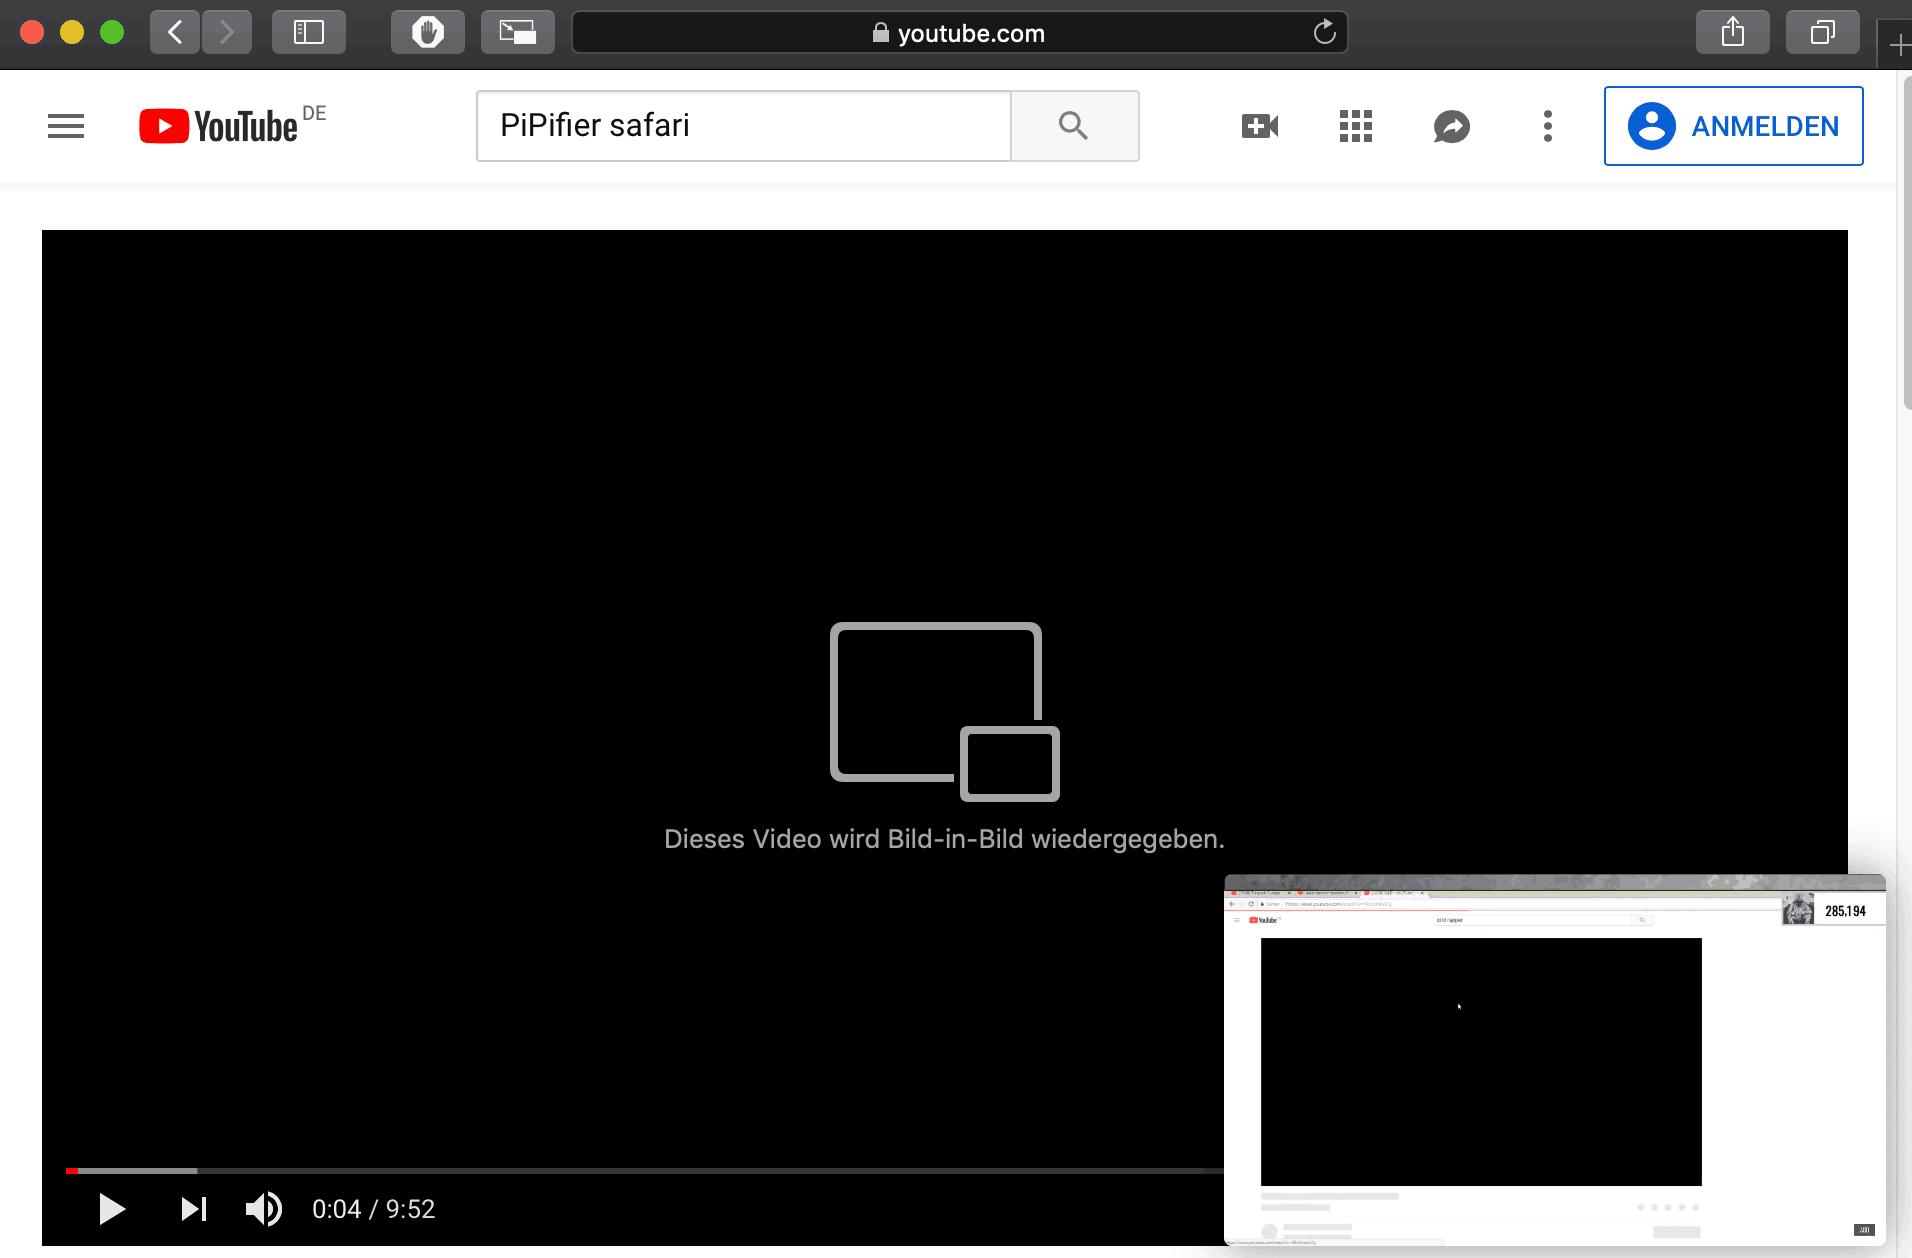 Youtube Bild-in-Bild PiPifier